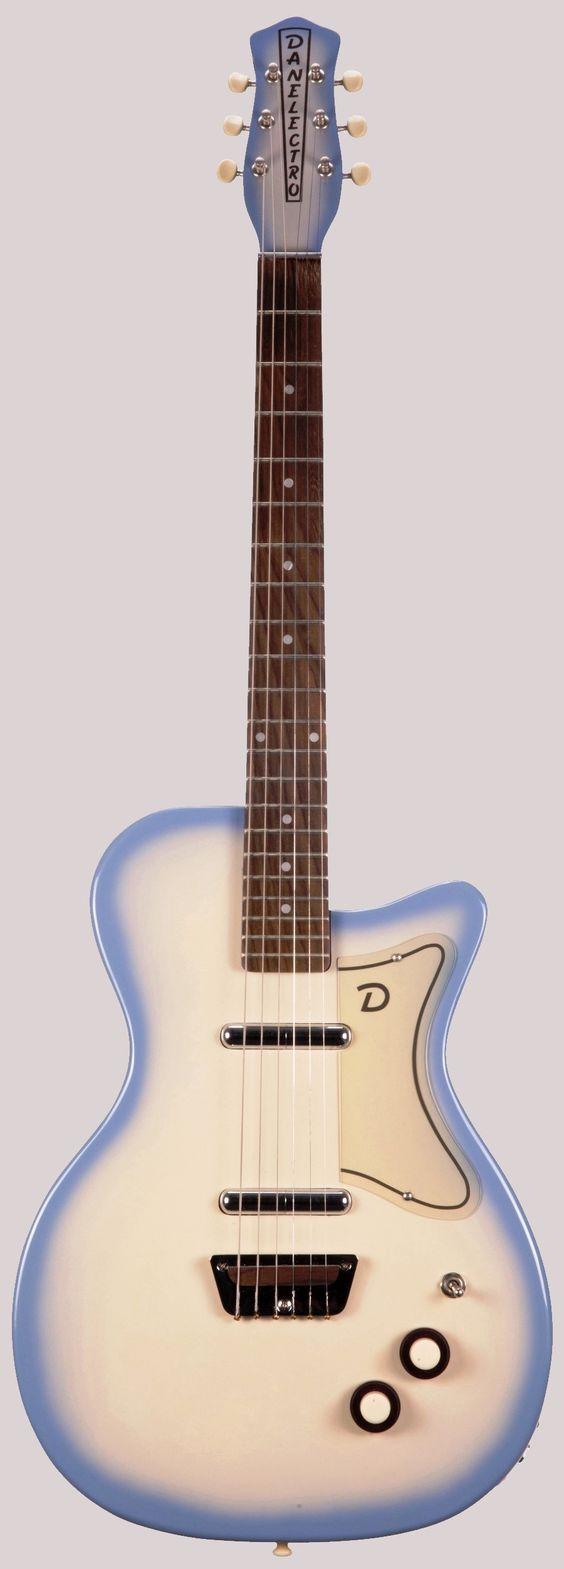 Danelectro U2 reissue guitar